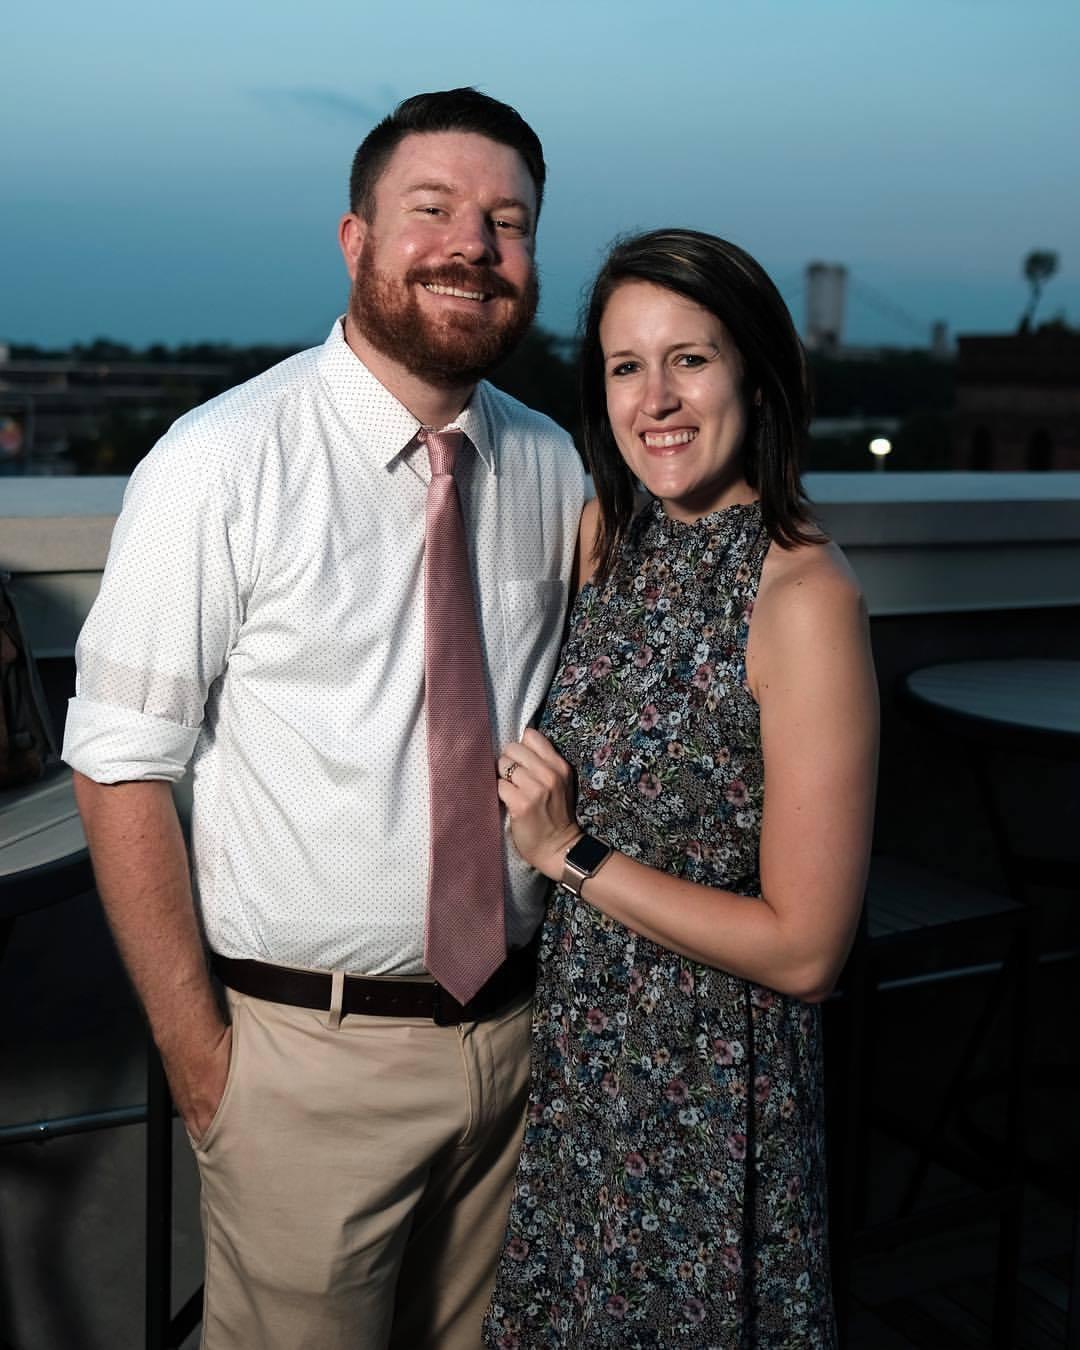 Wedding_Photographers_at_Hensville_Downtown_Toledo